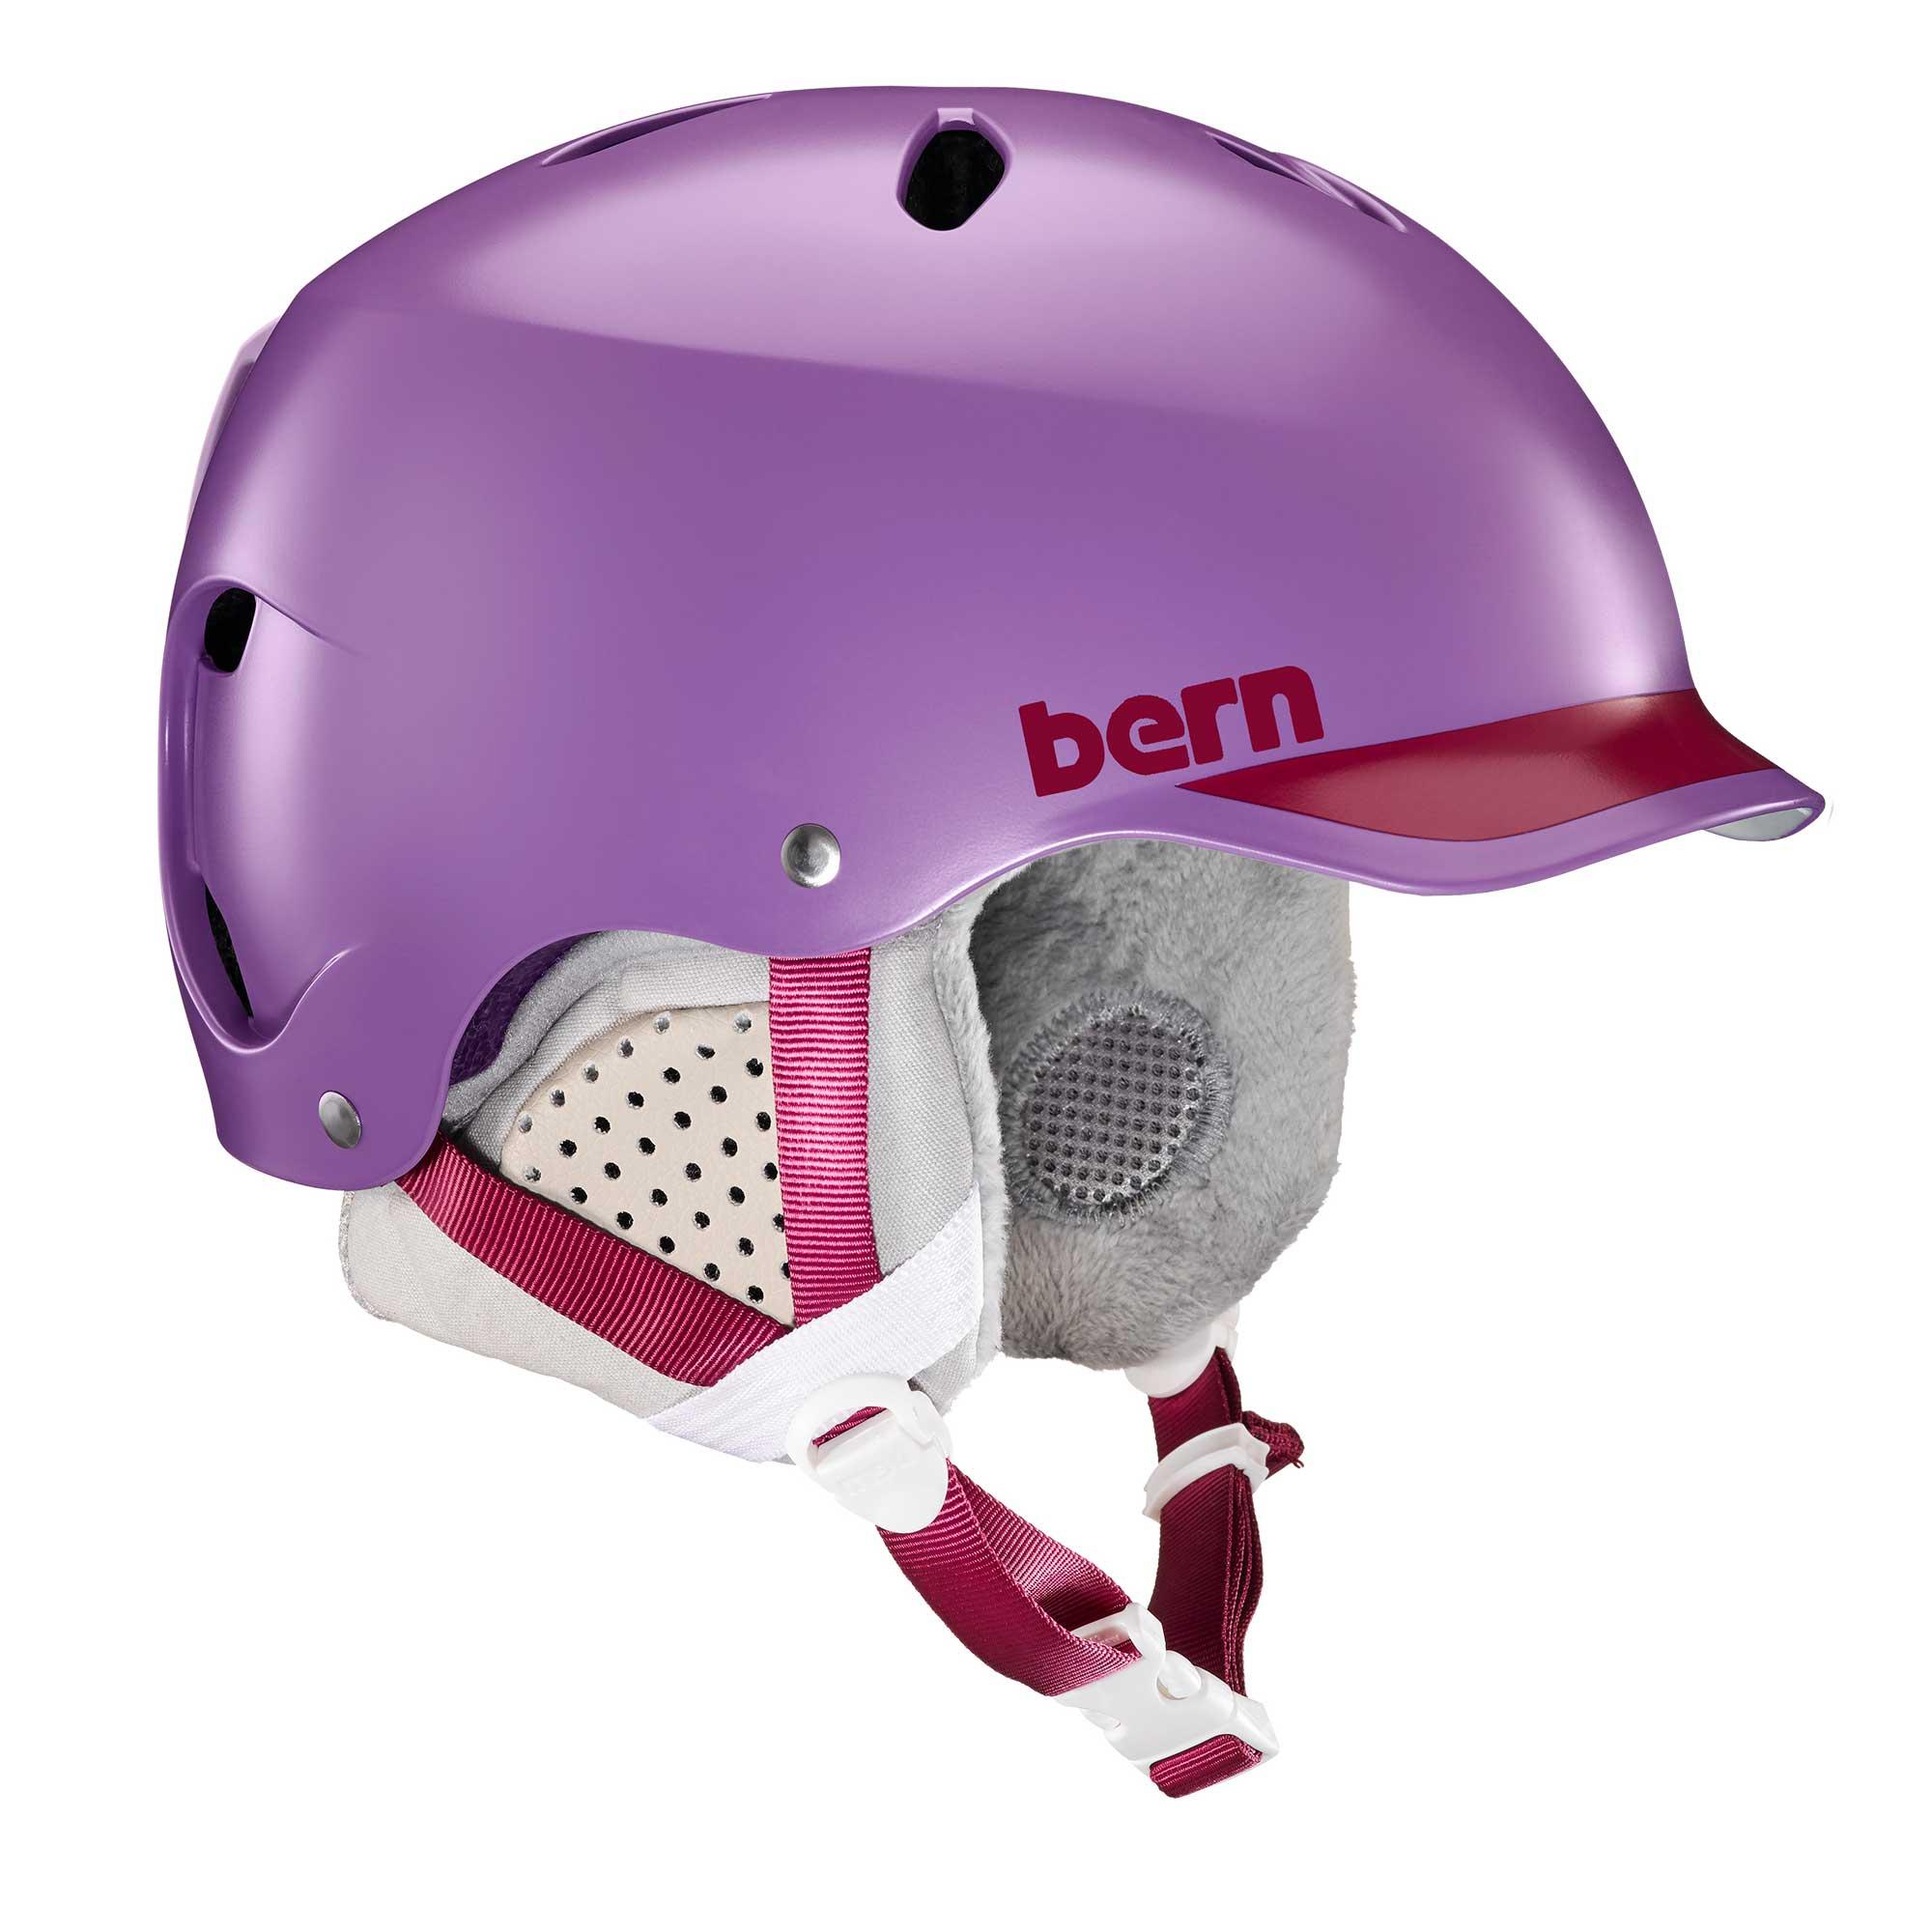 503672c1764 Bern Lenox Womens Helmet 2019